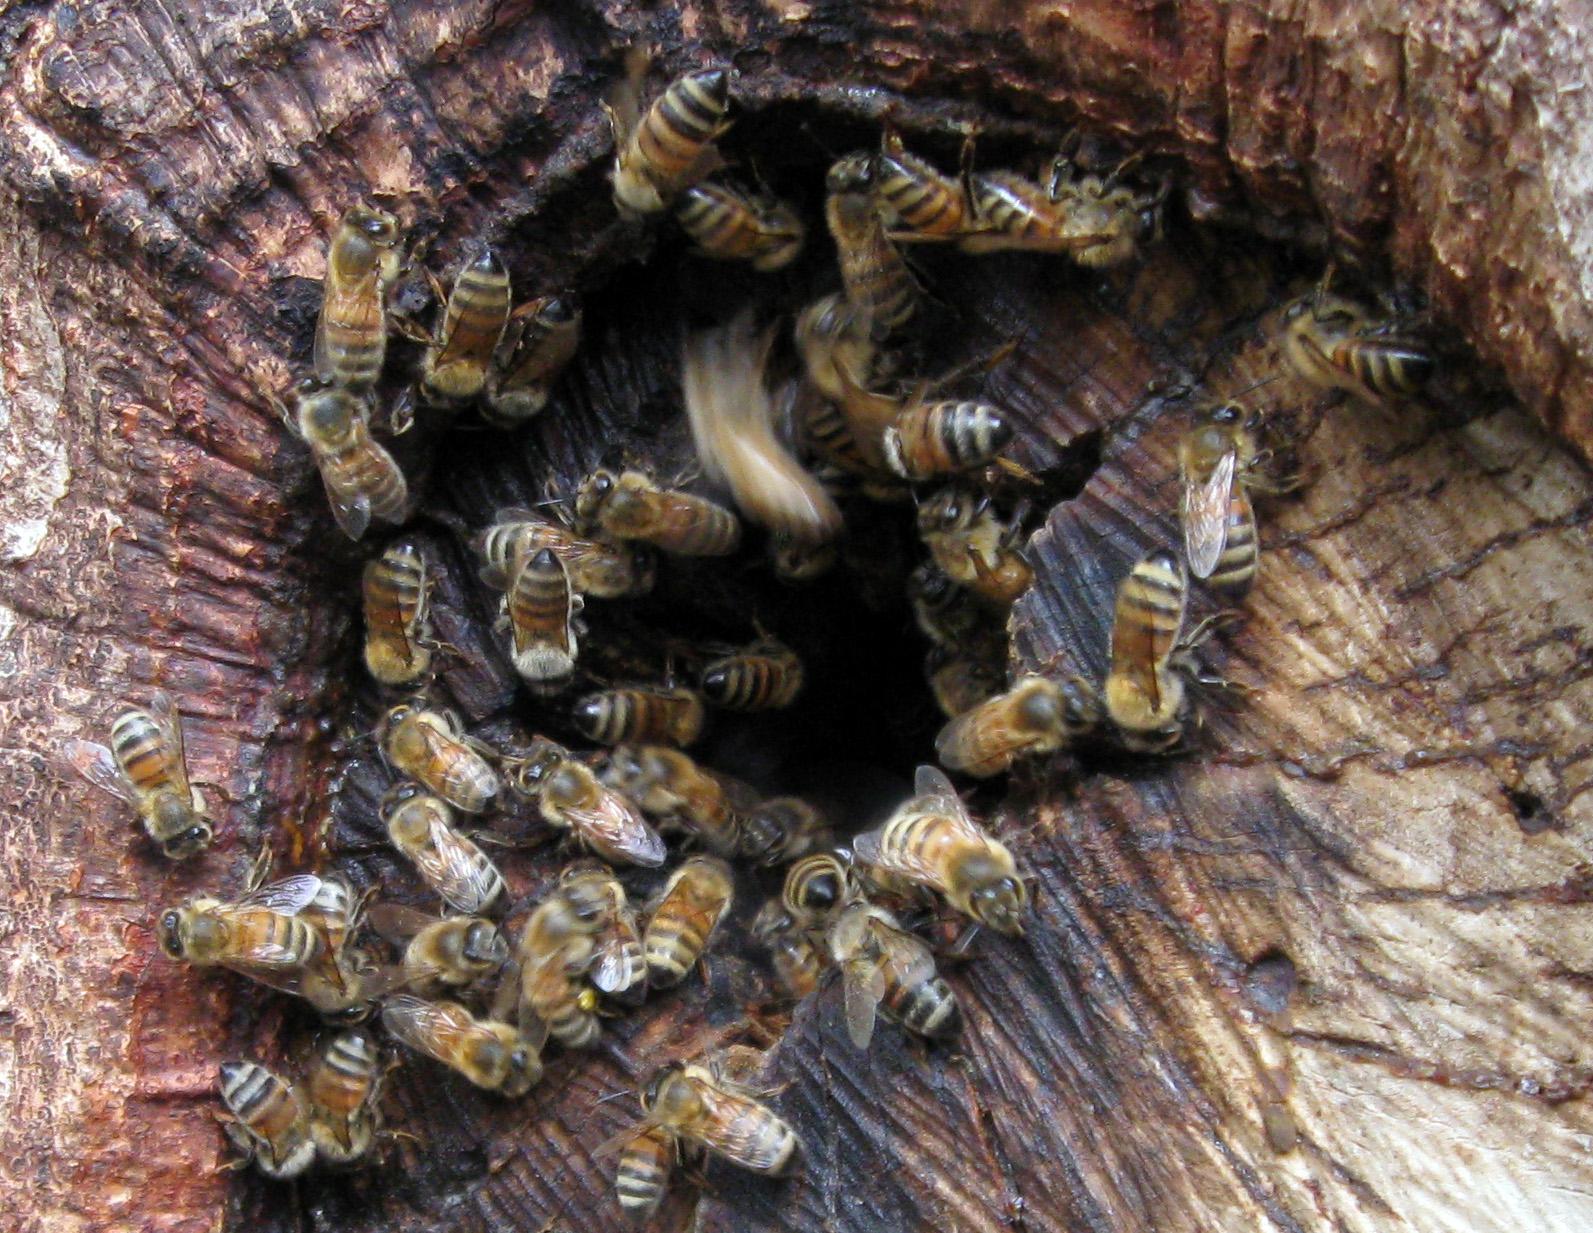 Honey bees cauldrons and cupcakes